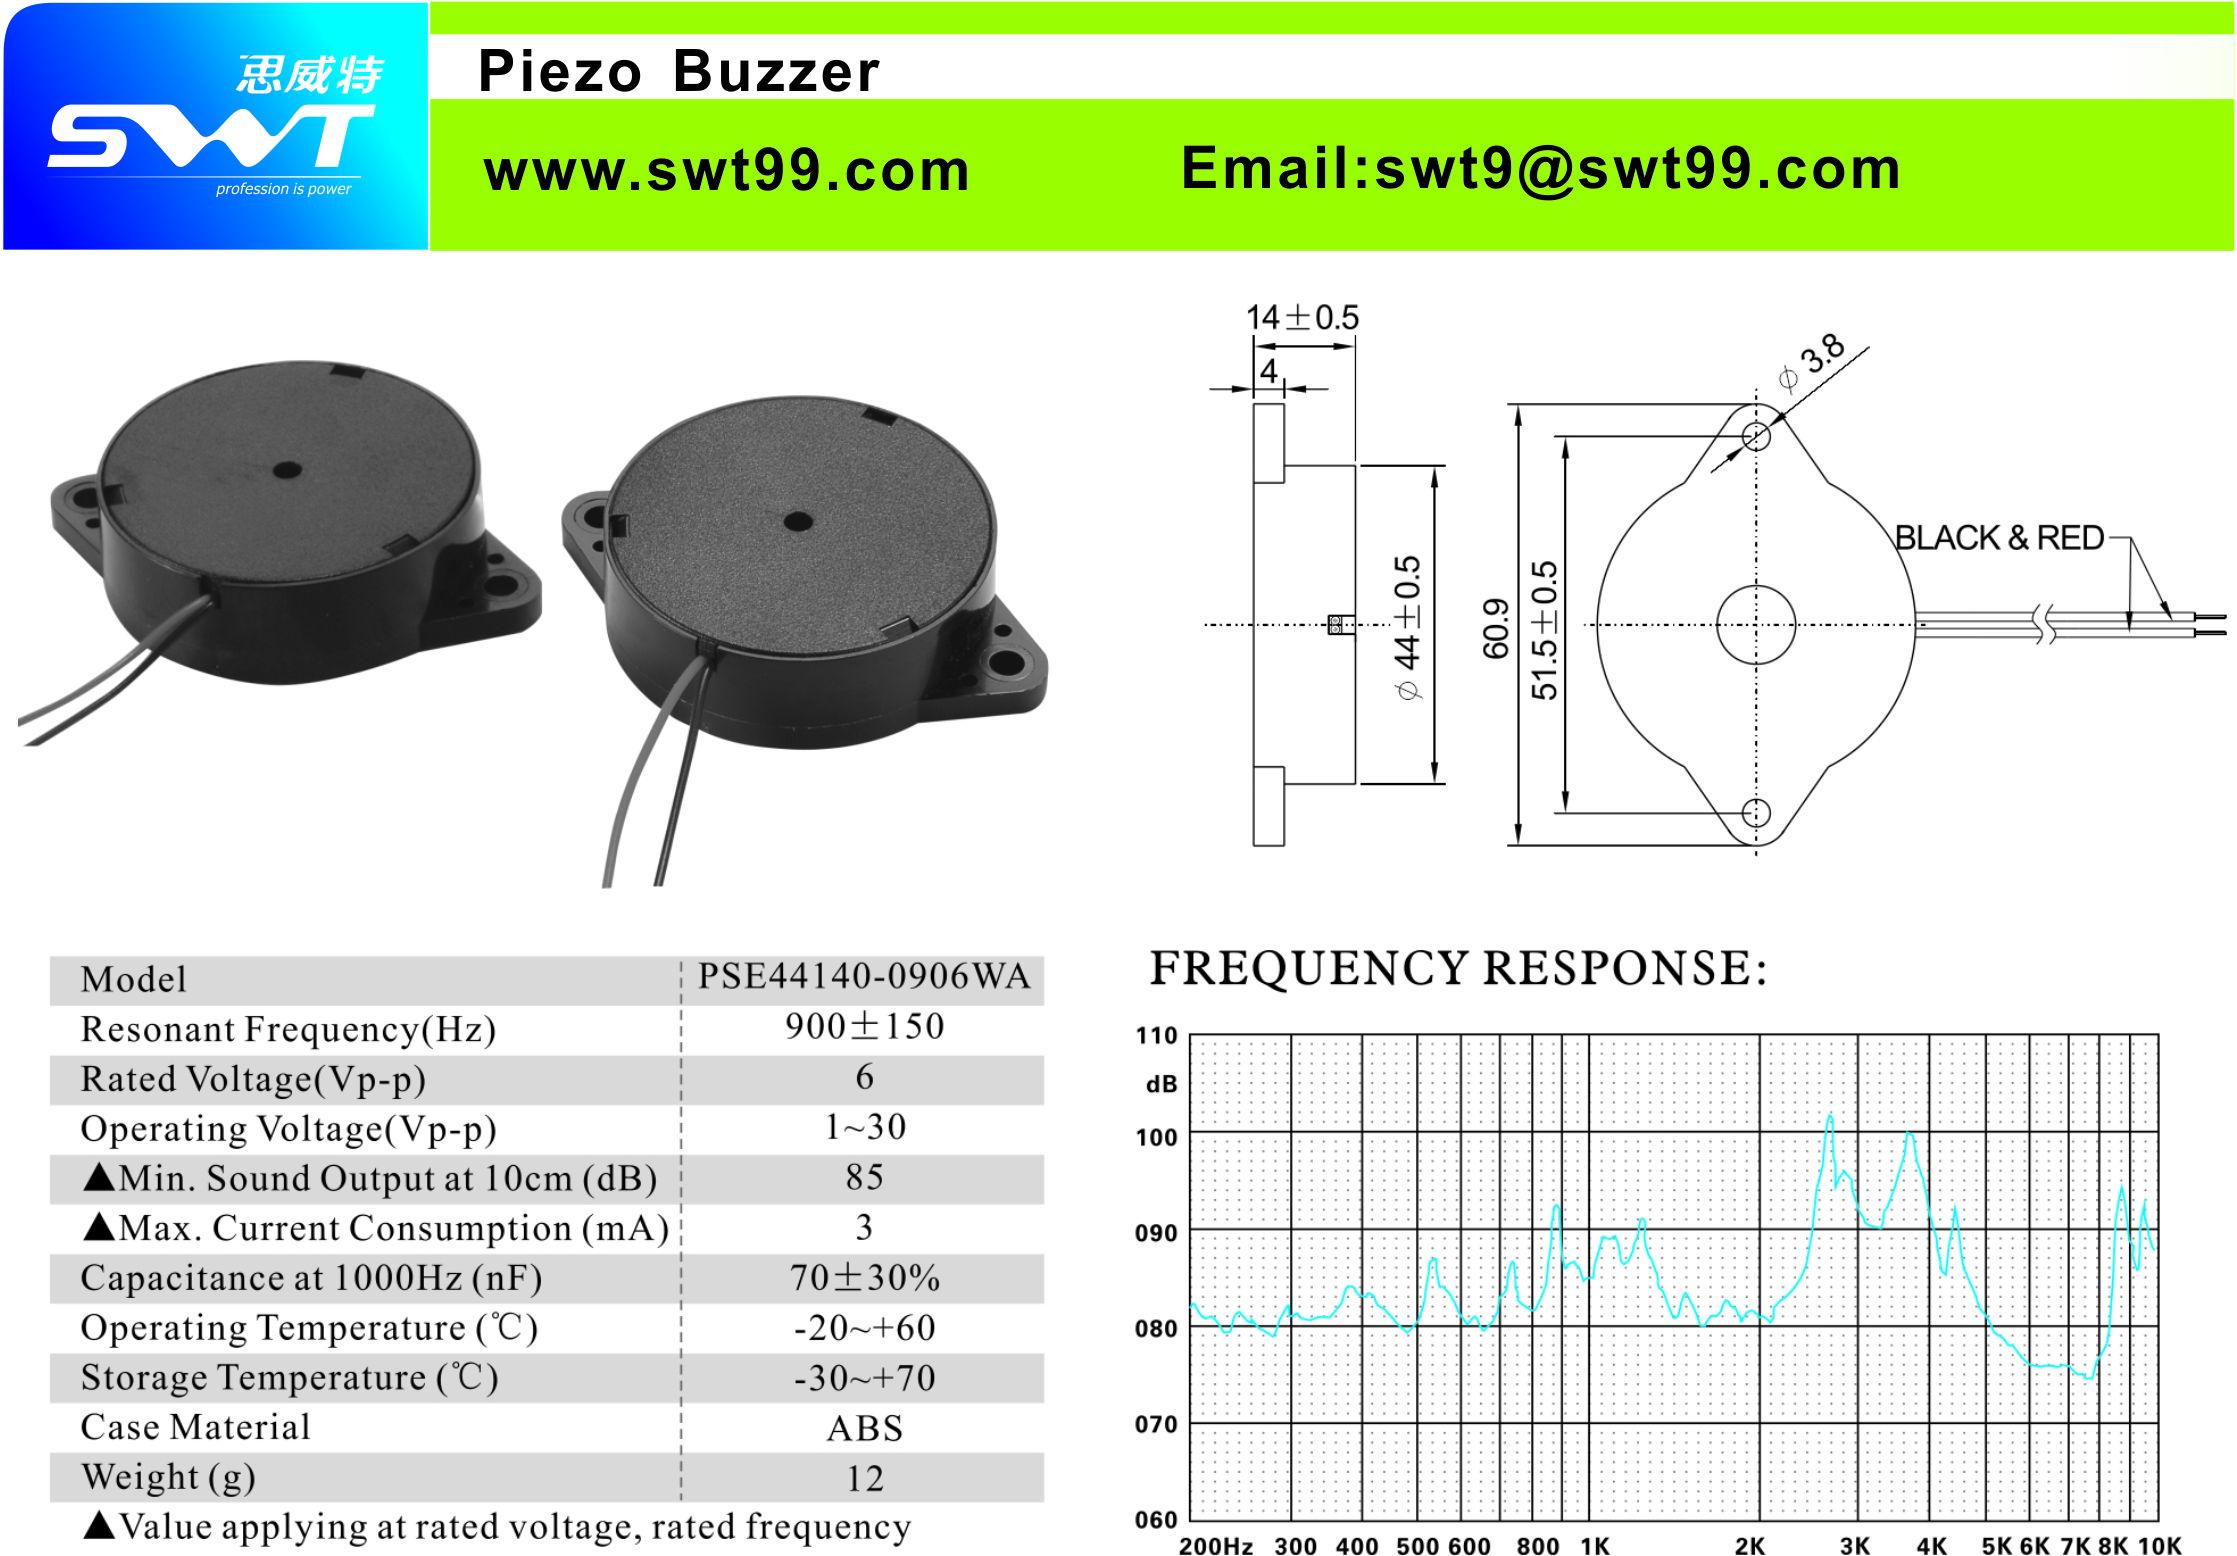 Buzzerpiezo Elementpiezo Atomizerultrasonic Series Dongguan Swt Piezo Buzzer Circuit Buzzersmd Elementmagnetic Atomizer